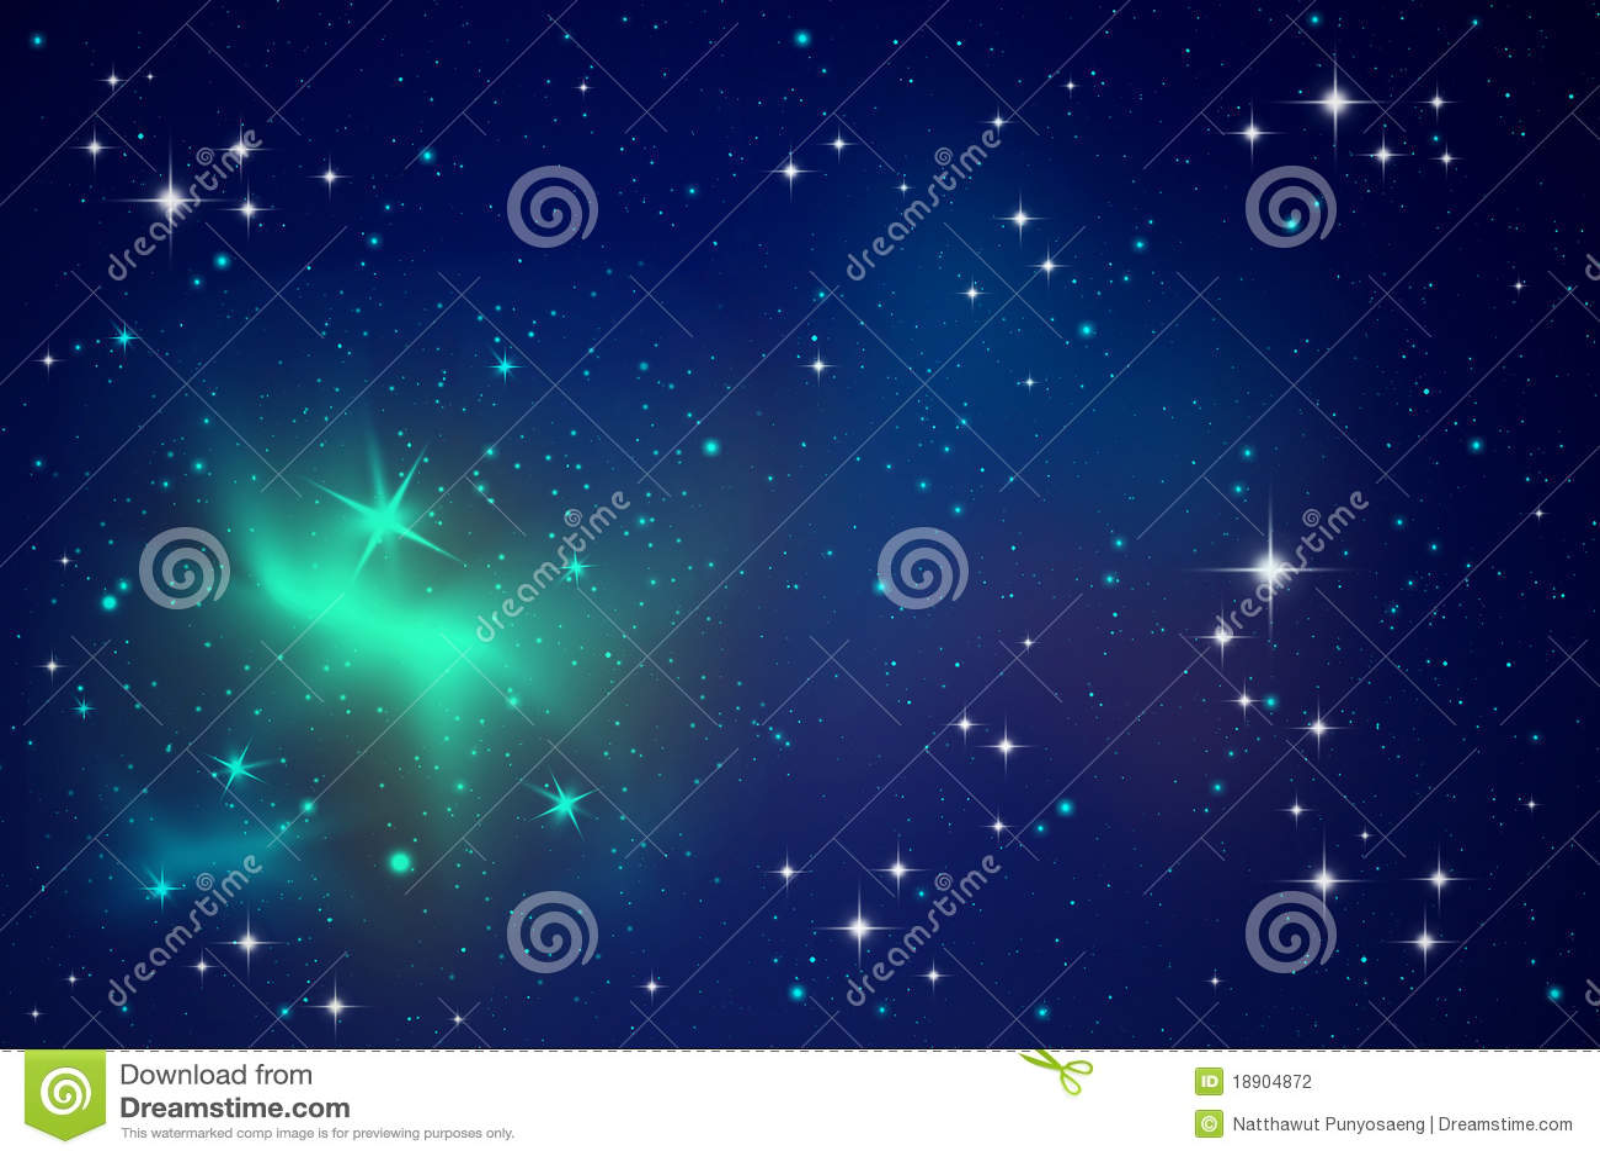 Lighting stars in the night sky